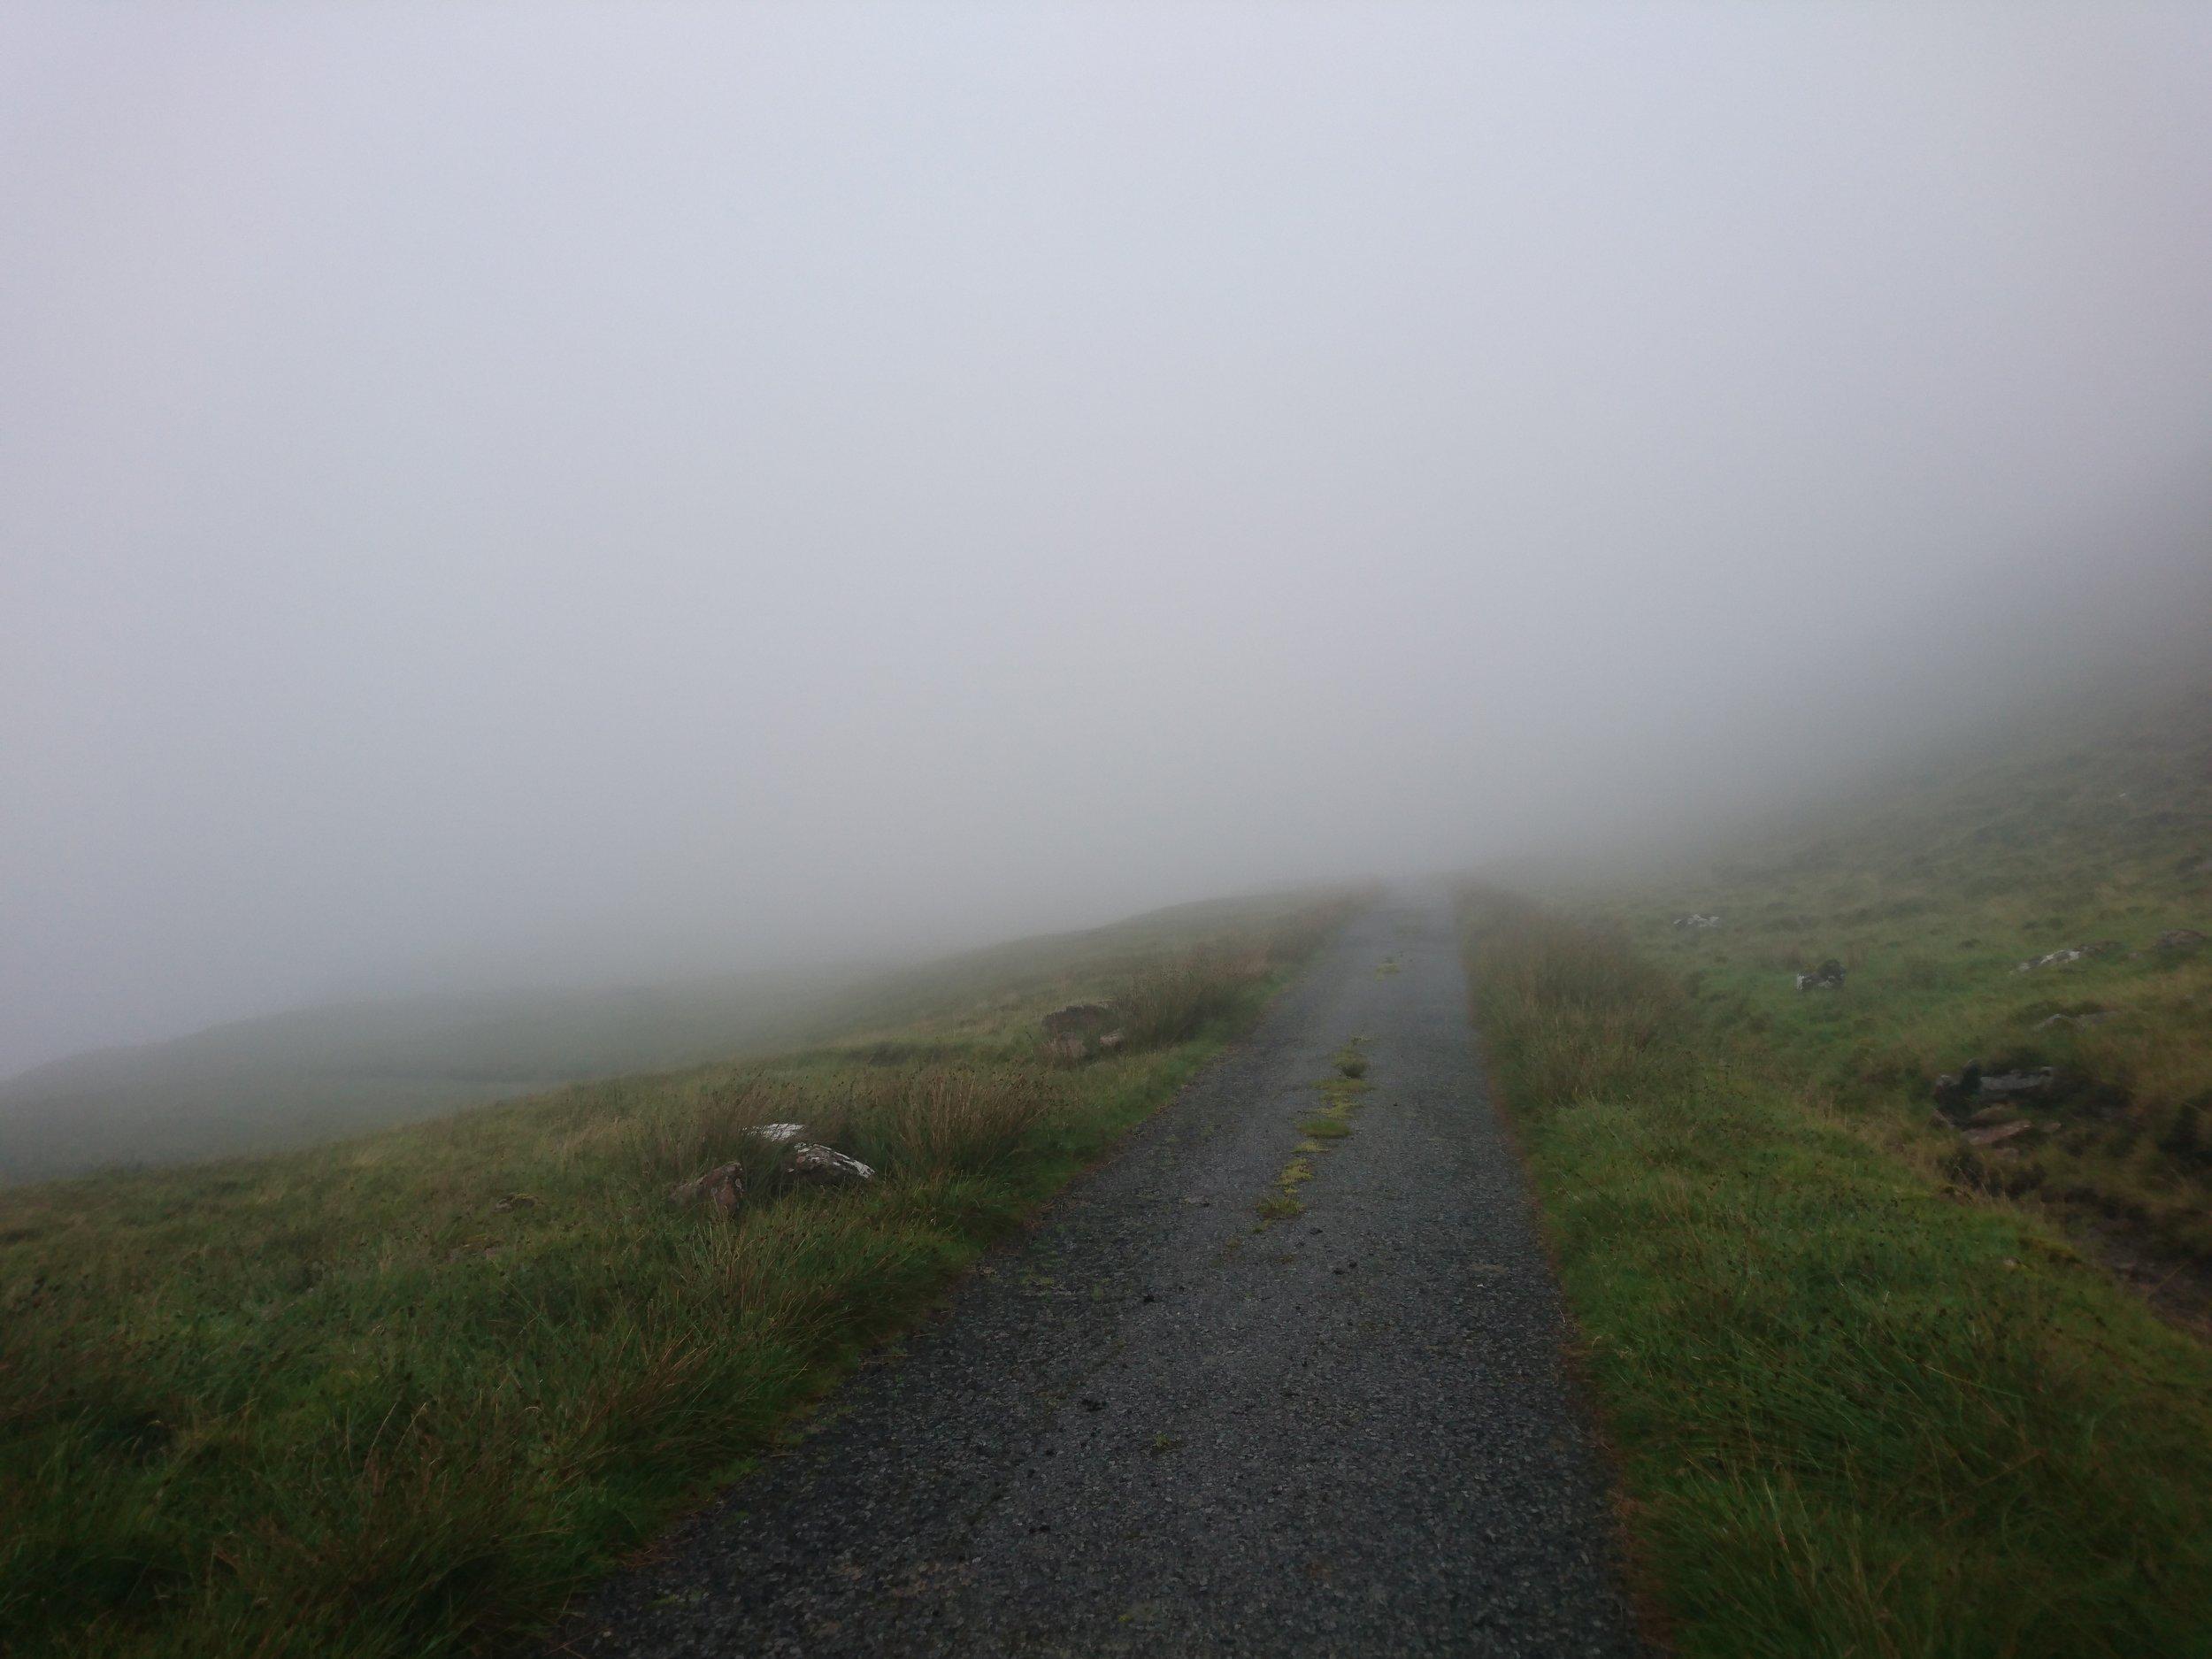 Tarmac Road into the Fog